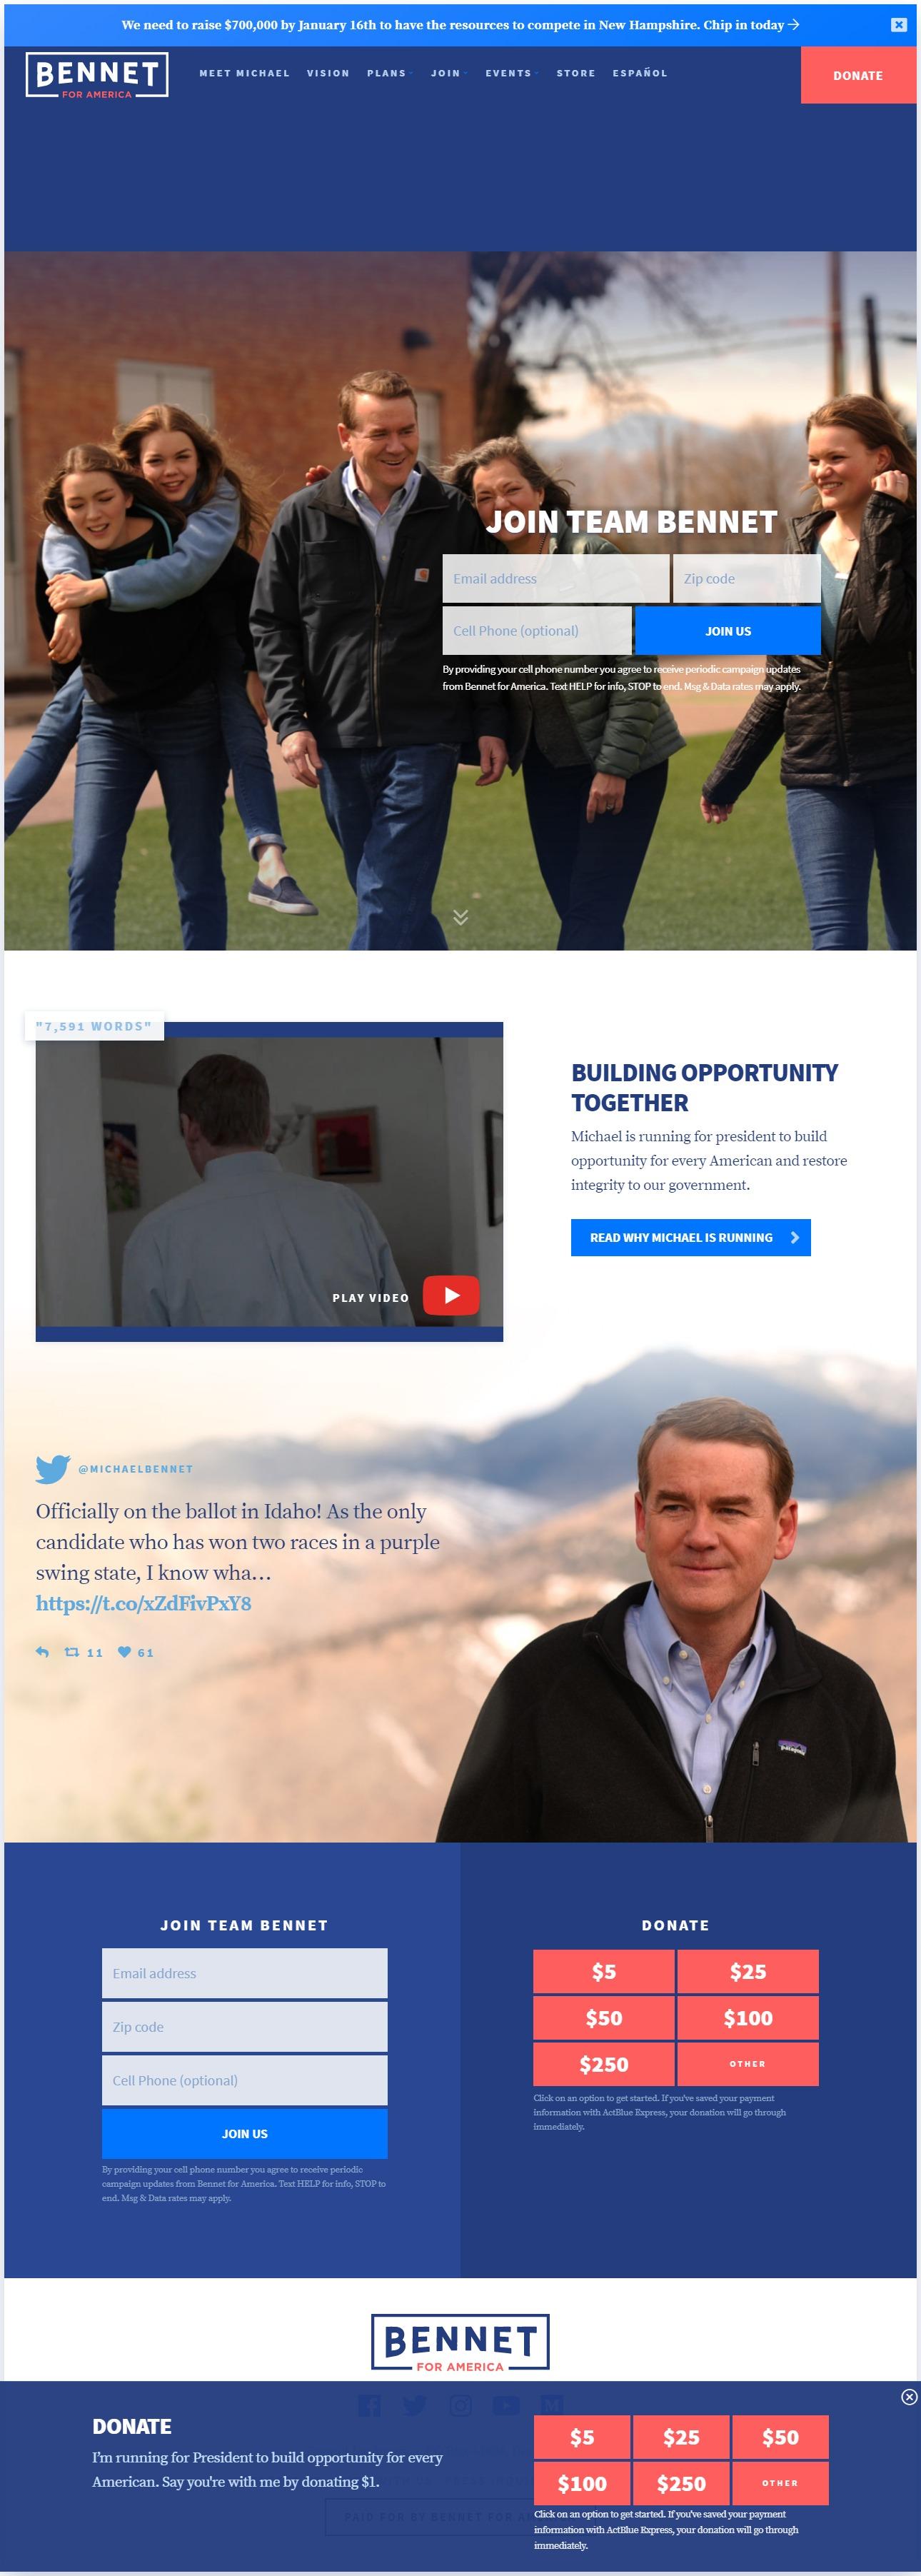 Homepage Snapshot for January 1, 2020: Senator Michael Bennet